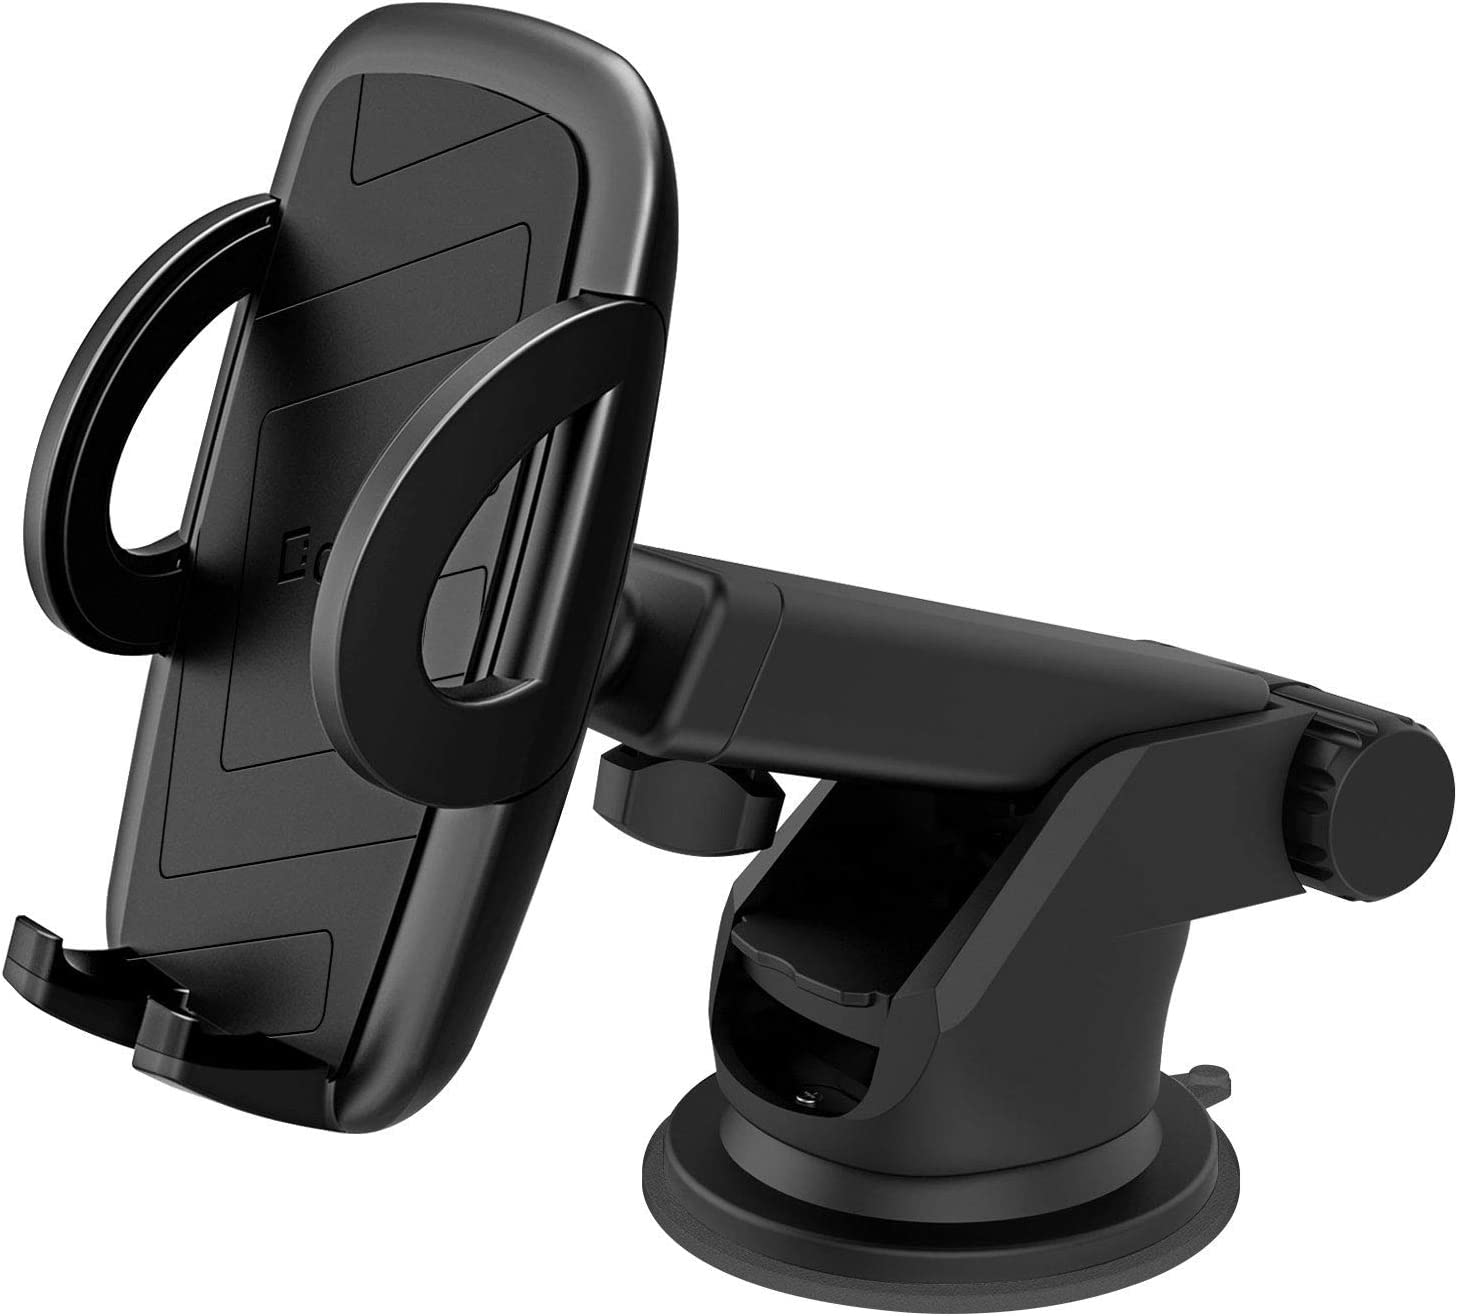 Compatible for LG K20 V//Q7+//Stylo 4//Stylo3//2//Q Stylus//V35 ThinQ//V30//V20//G7 ThinQ//G6//G5//Aristo 2 Plus//K8//K30//K20//X Venture//Tribute Dynasty?X Charge 4350470257 Cradle Car Phone Holder Cellet CD Slot Mount